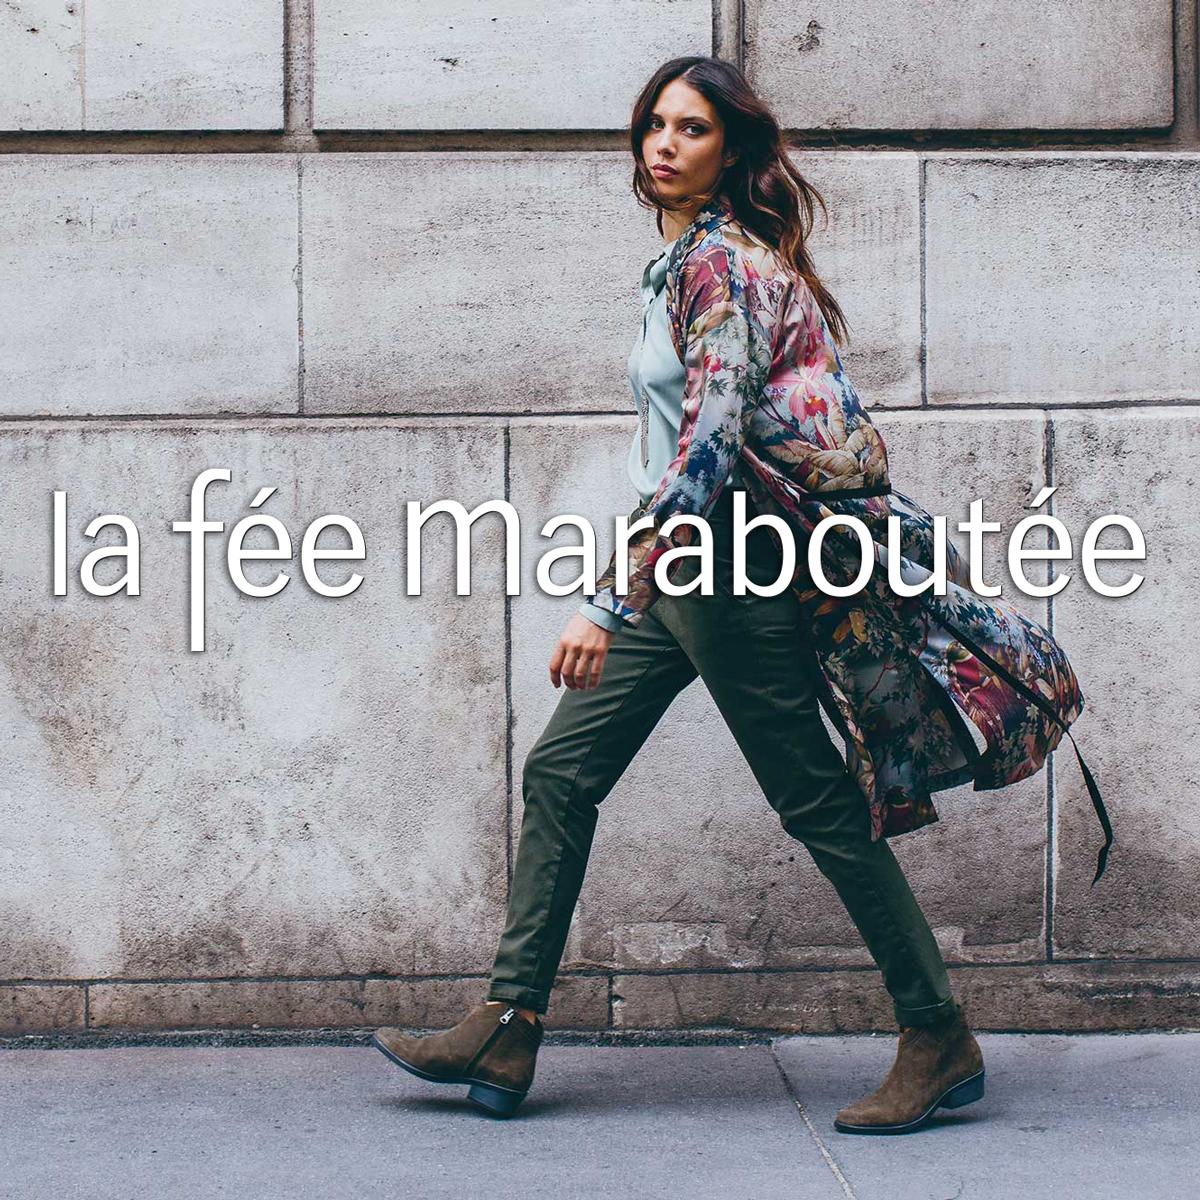 fee-maraboutee-square